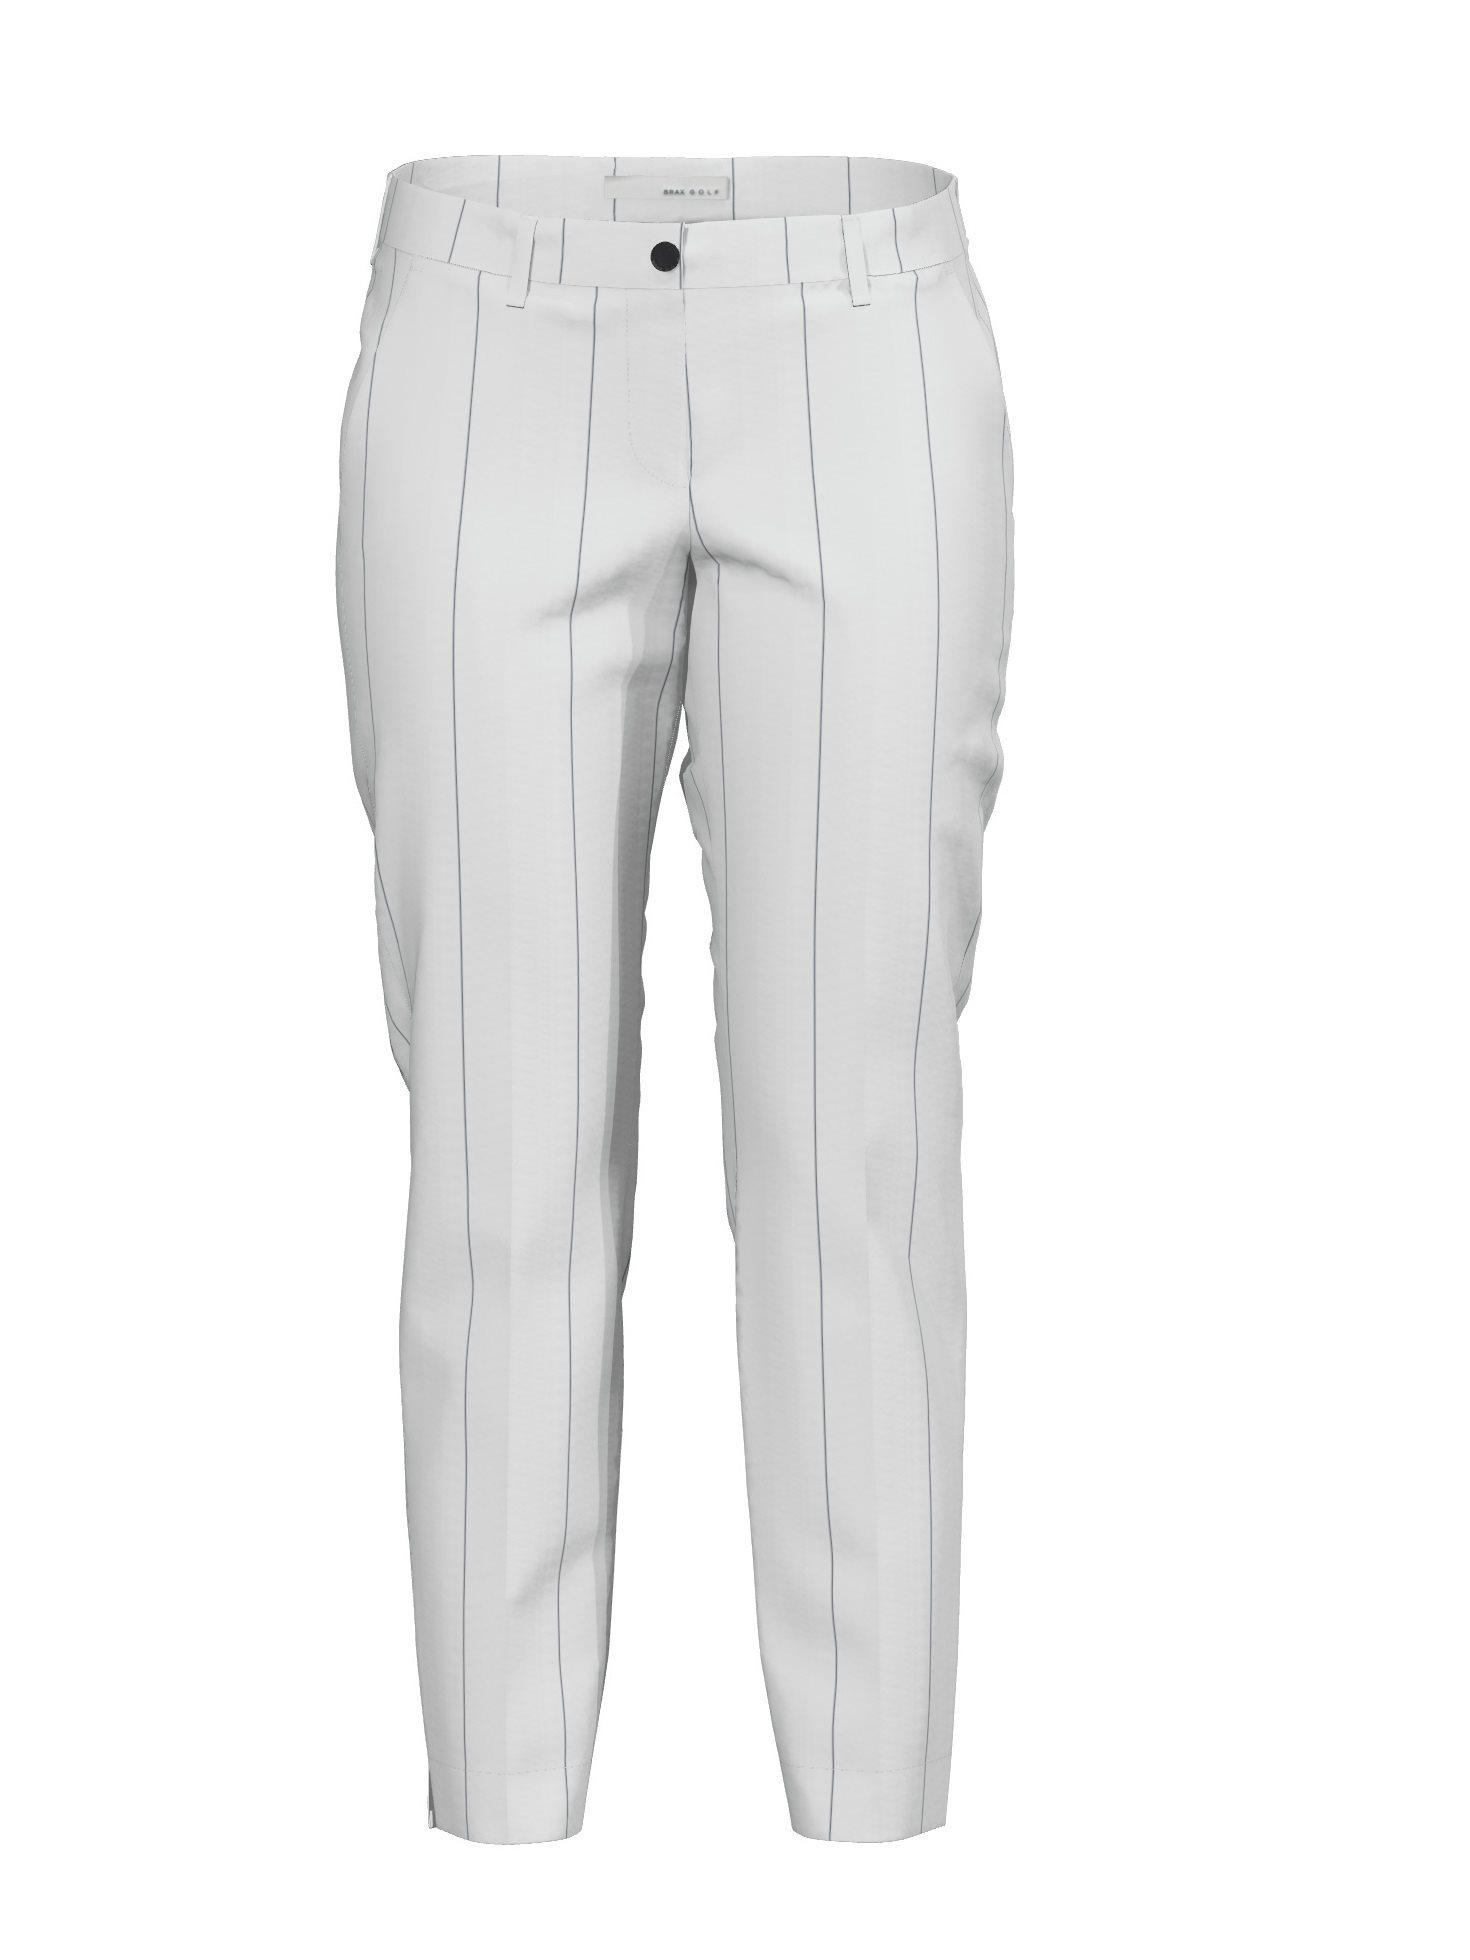 Brax dames pantalon Cloe high water (7/8) streepje wit-zwart